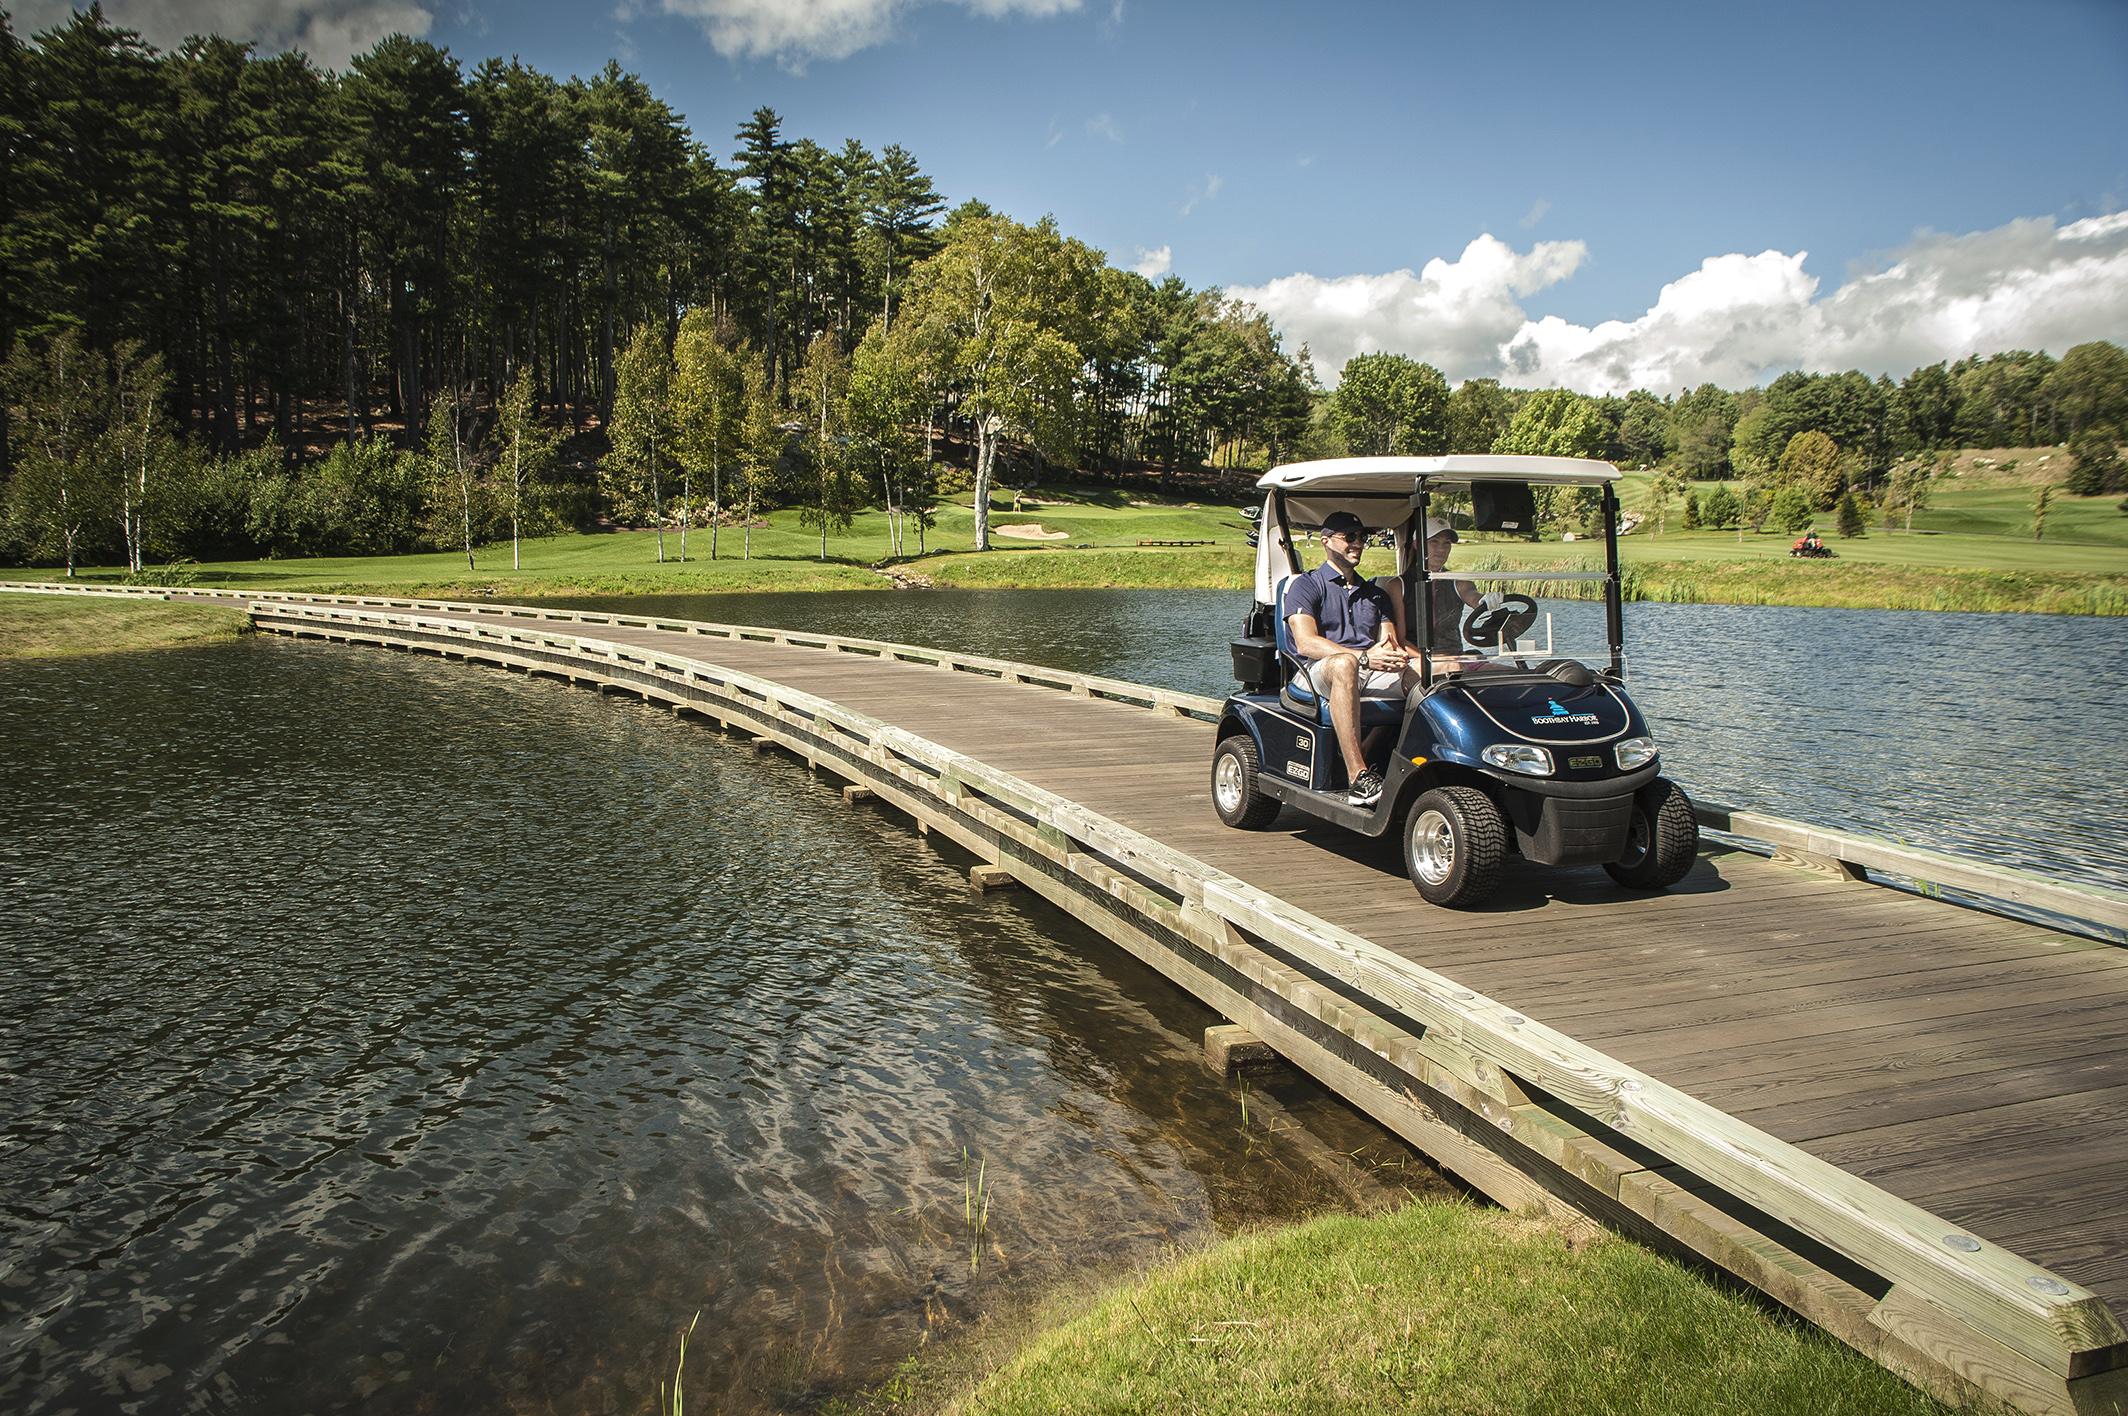 170908_BHCC_Golfing_206 web.jpg